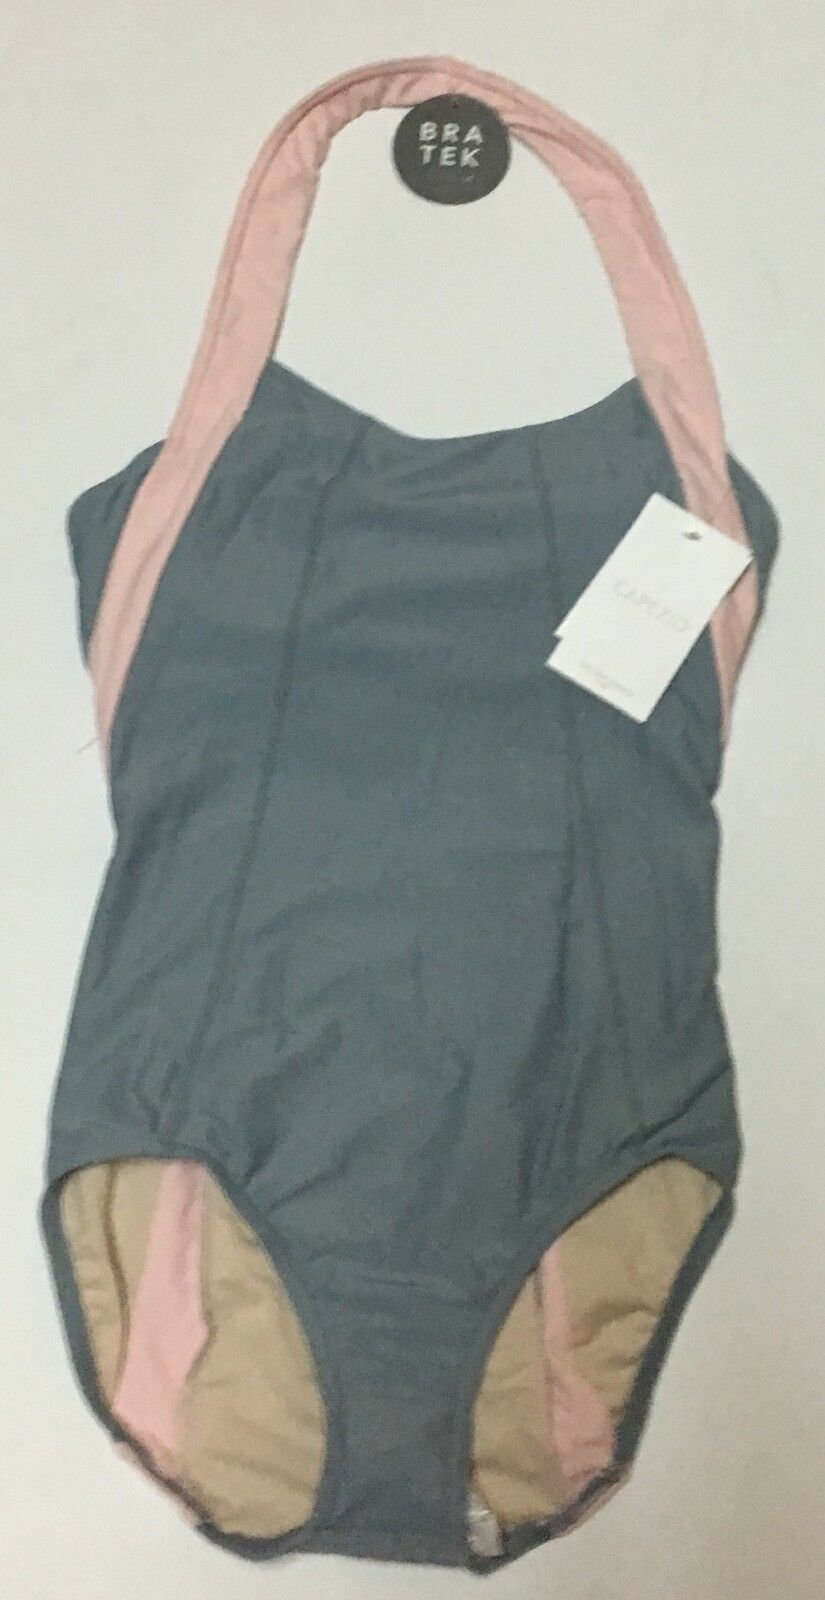 Capezio Bra Tek Dancewear Leotard Various Sizes Gray & Pink NWT image 2